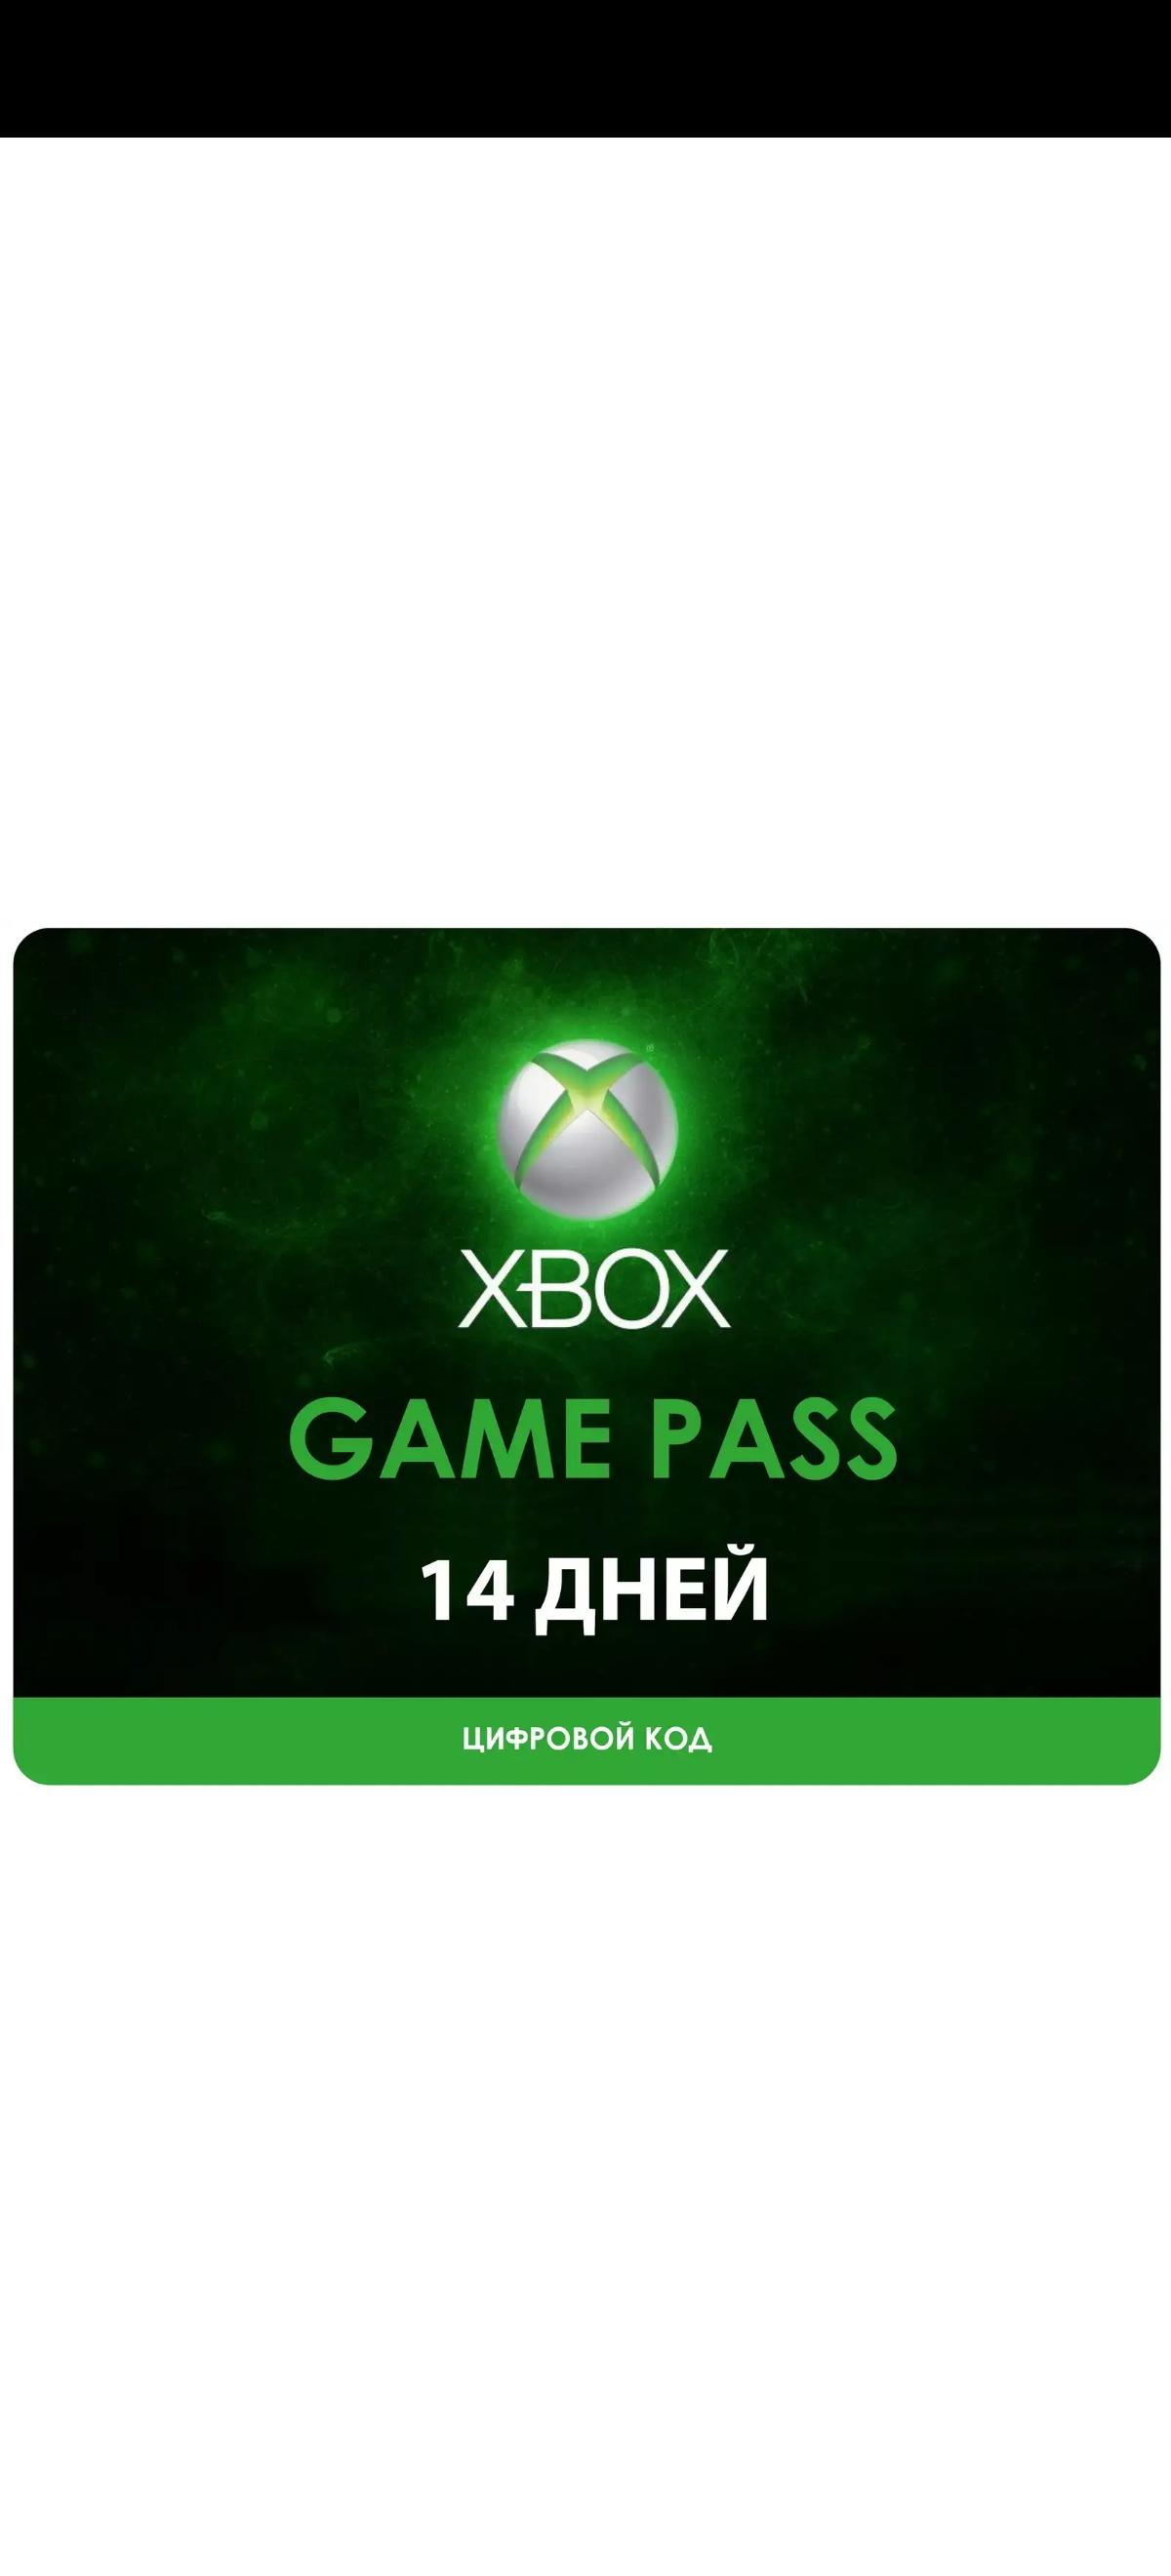 Фотография xbox game pass ultimate 14д активация vpn 5мин. us